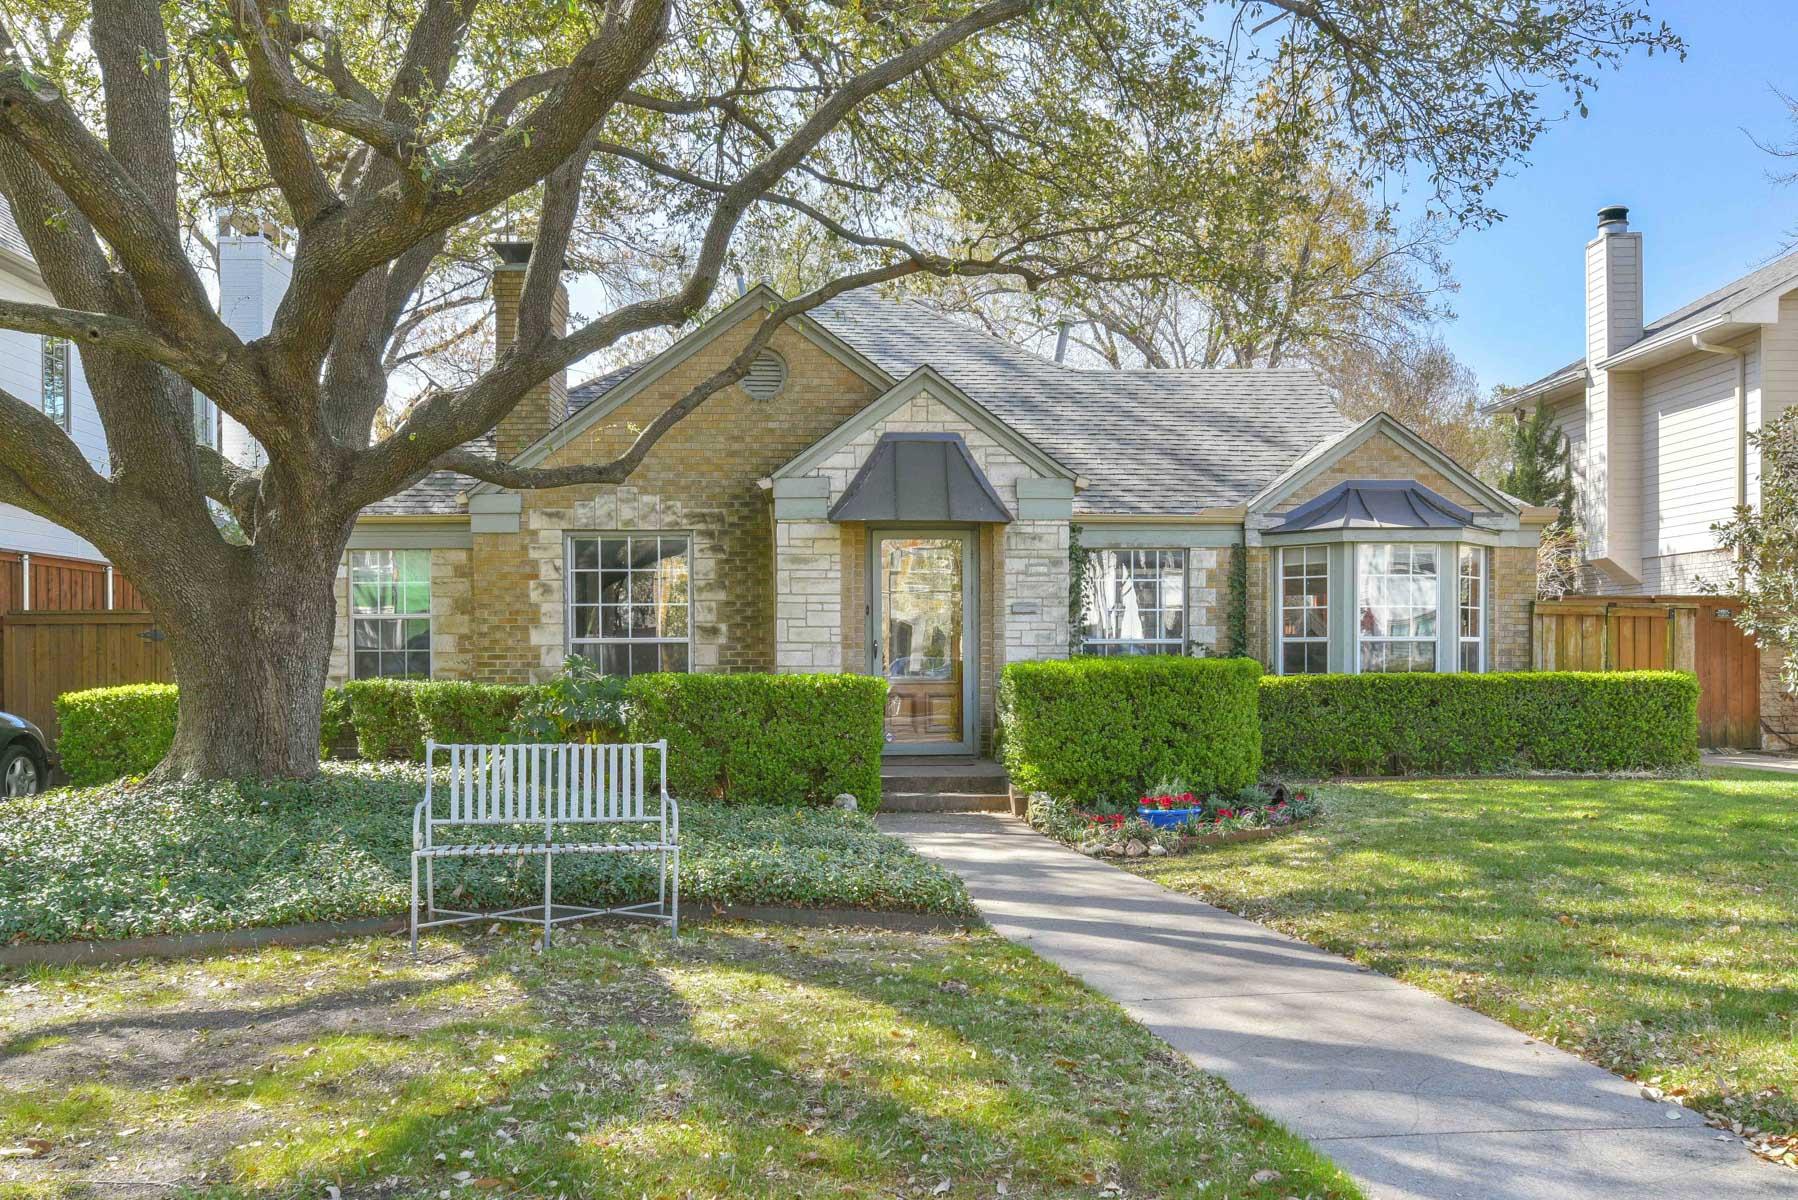 獨棟家庭住宅 為 出售 在 Charming University Park Traditional 4313 Purdue Ave Dallas, 德克薩斯州, 75225 美國